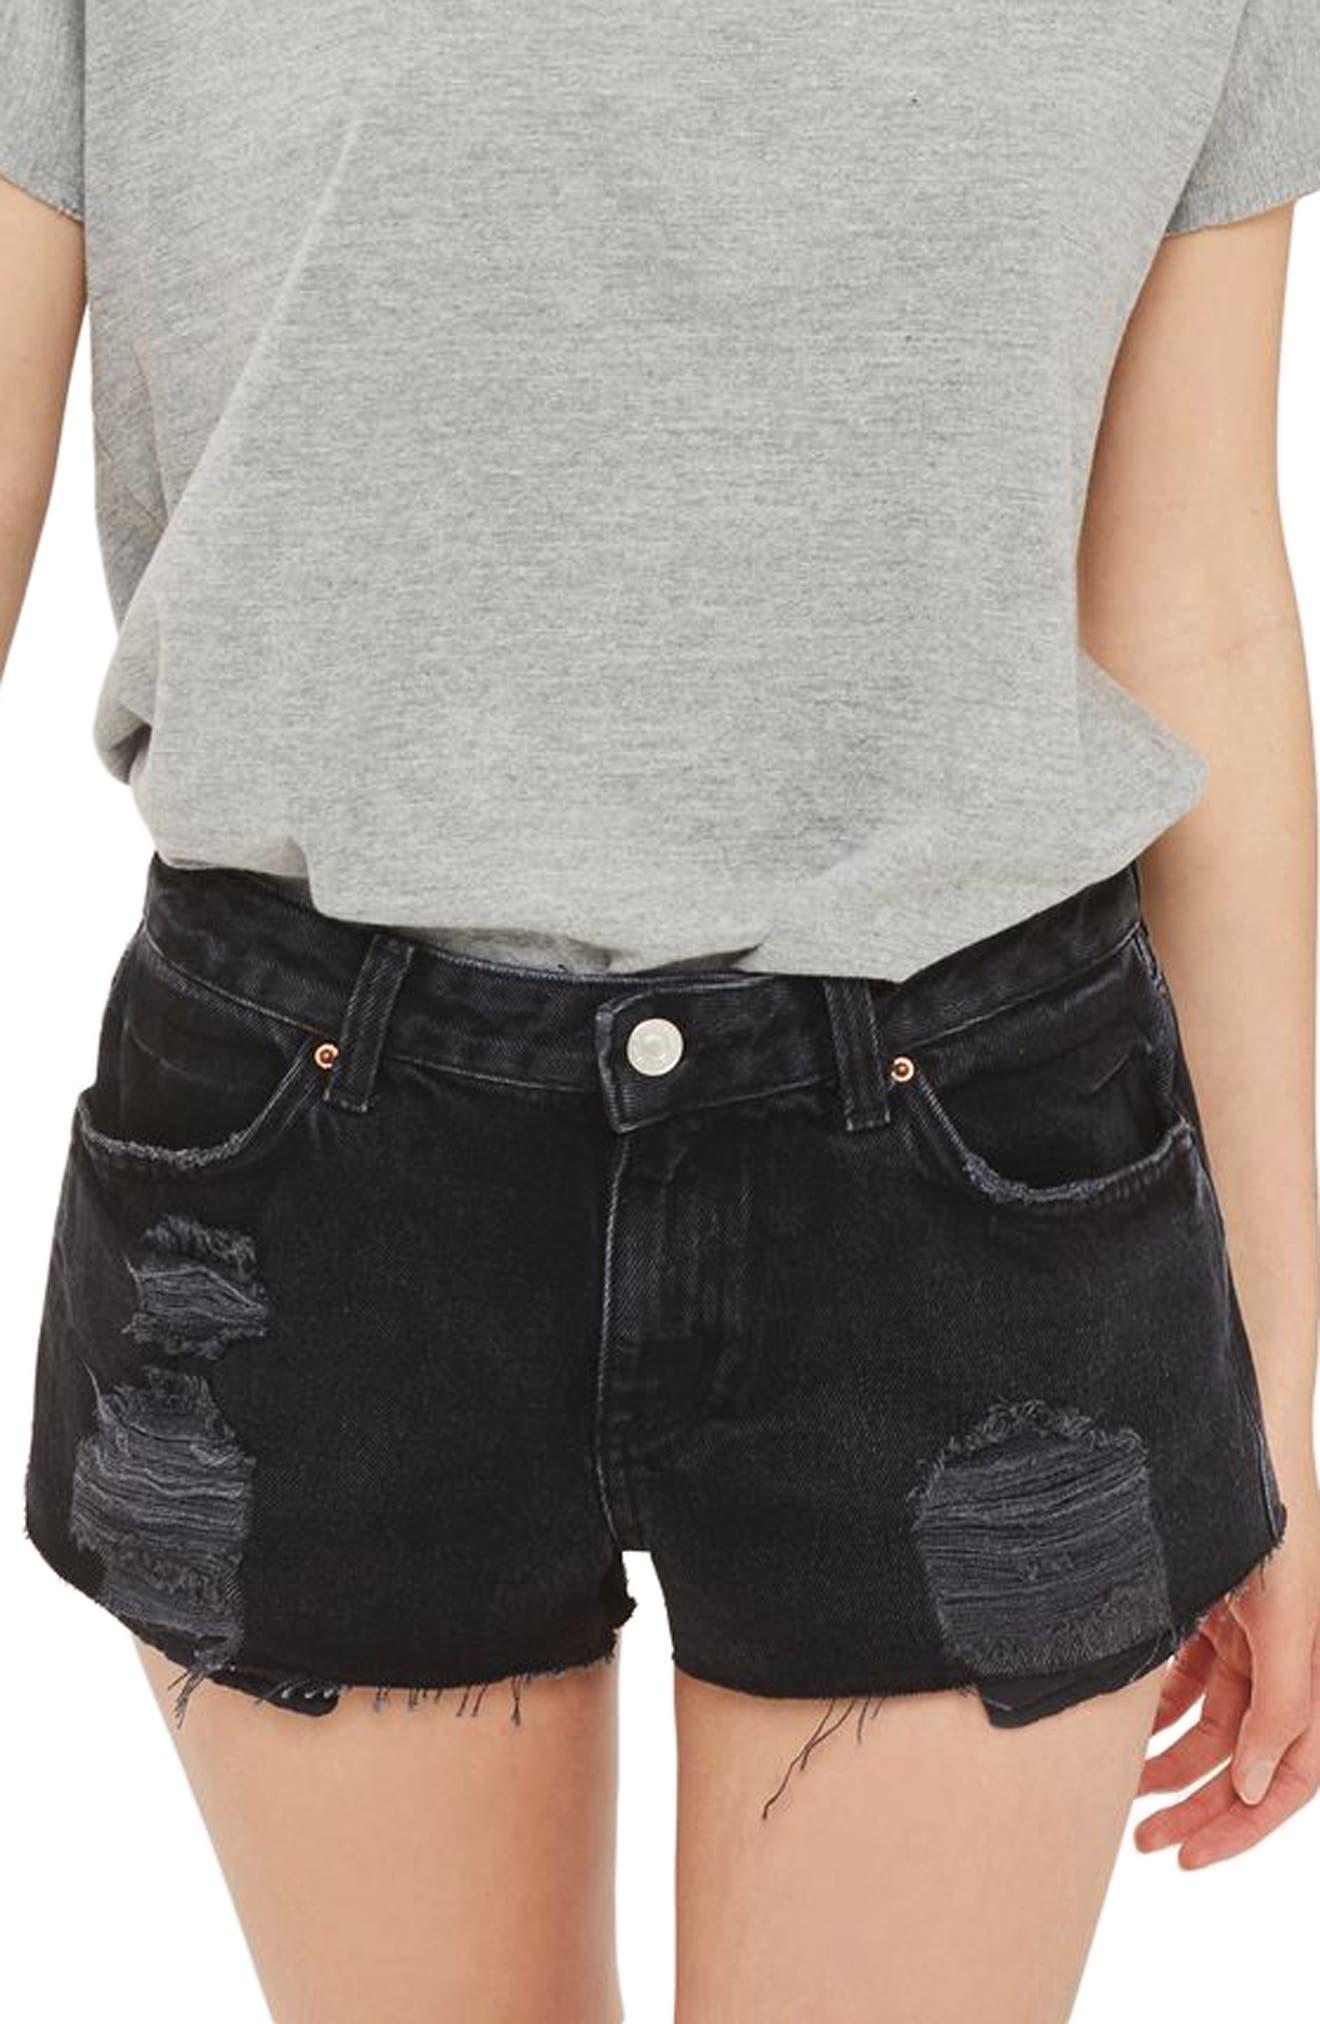 Topshop Cory Ripped Black Denim Shorts